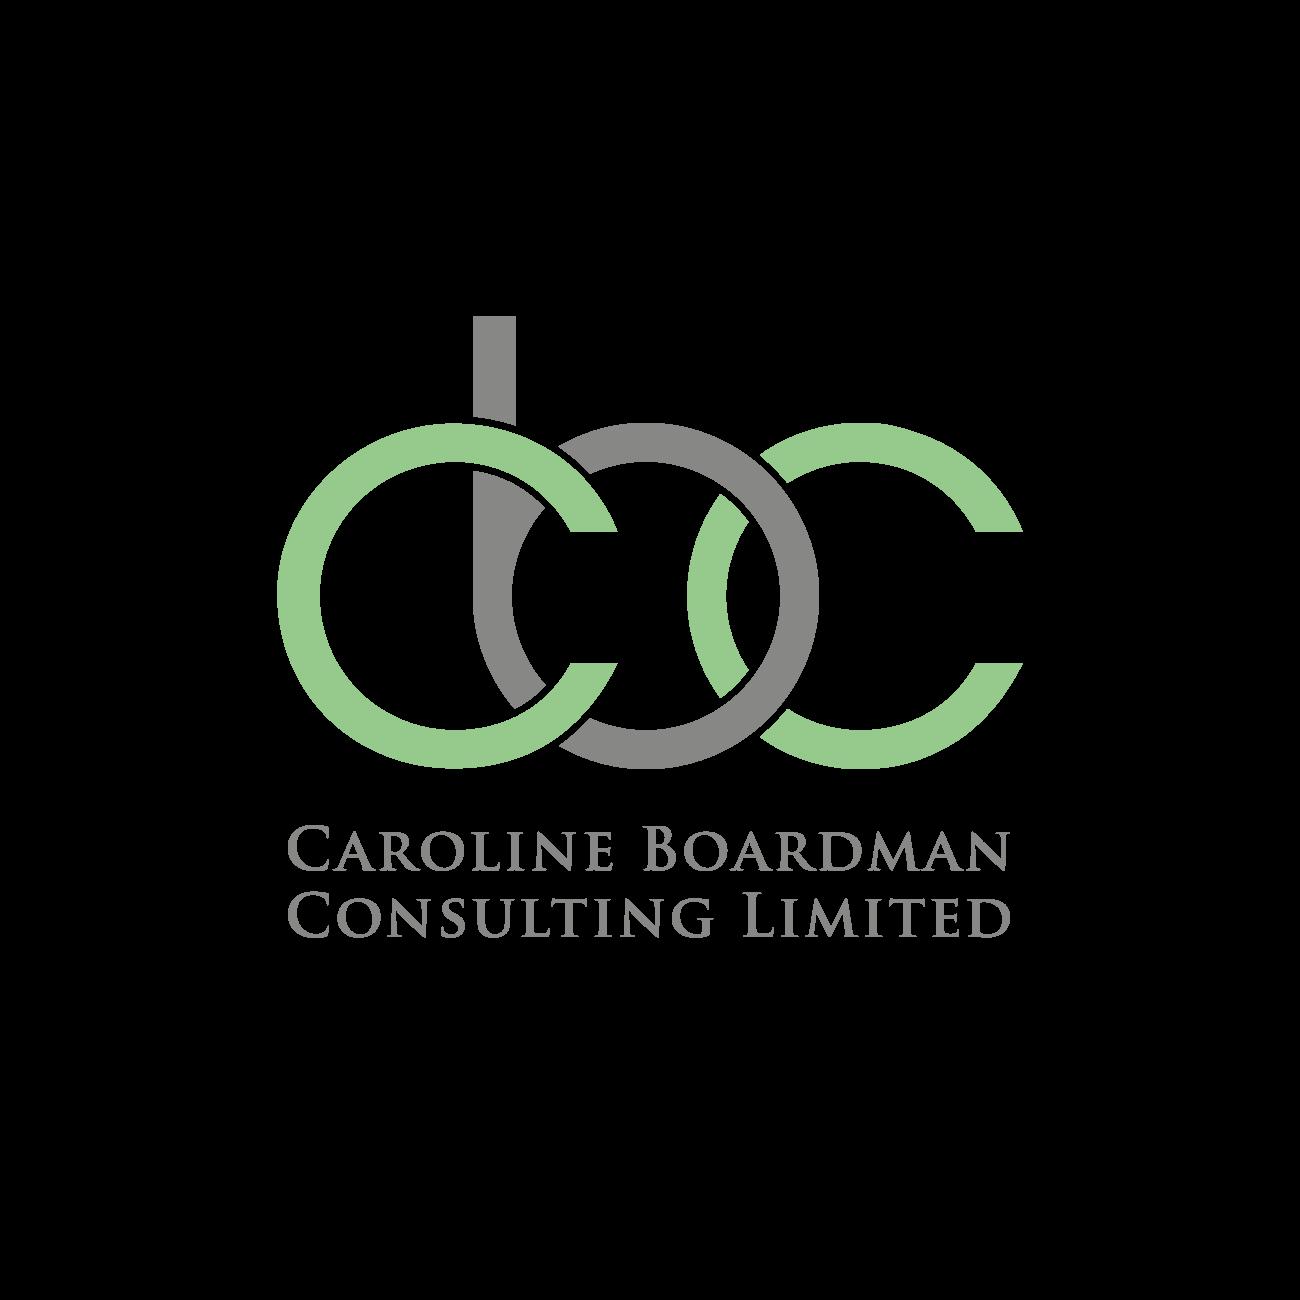 Caroline Boardman Consulting